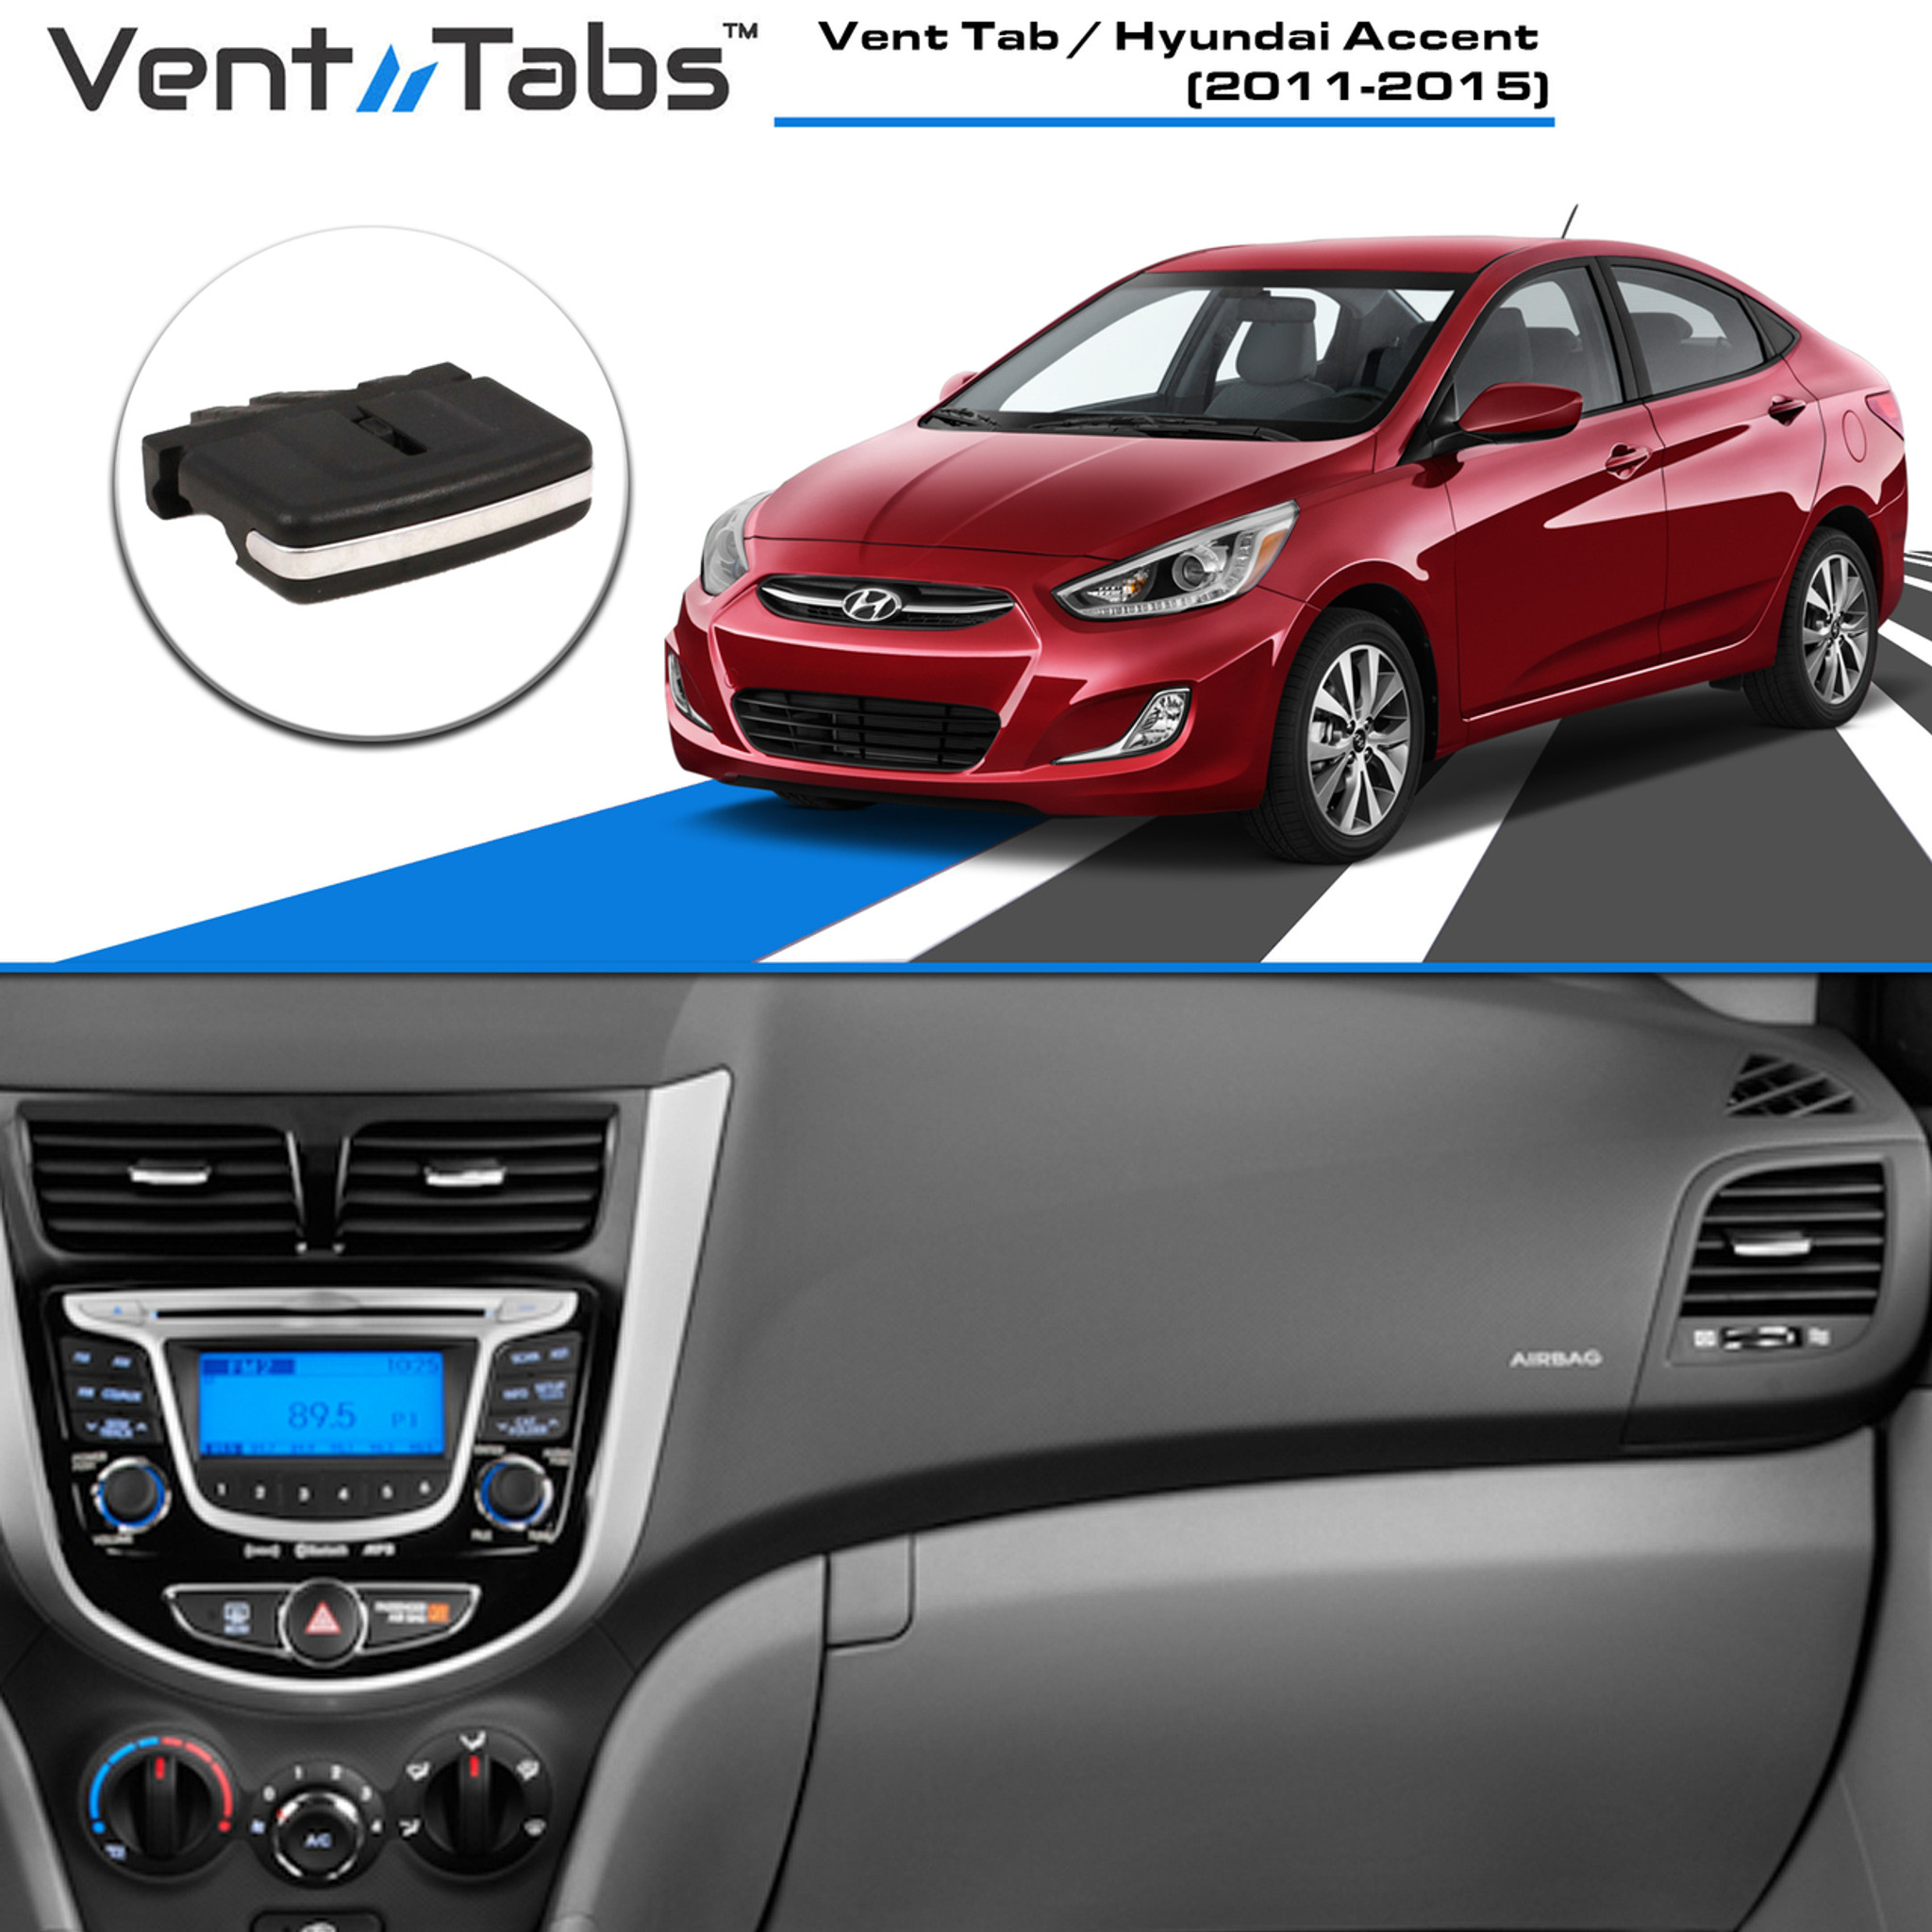 Hyundai Models 2015 >> Buy Vent Tabs Ac Vent Clips Hyundai Accent 2011 2015